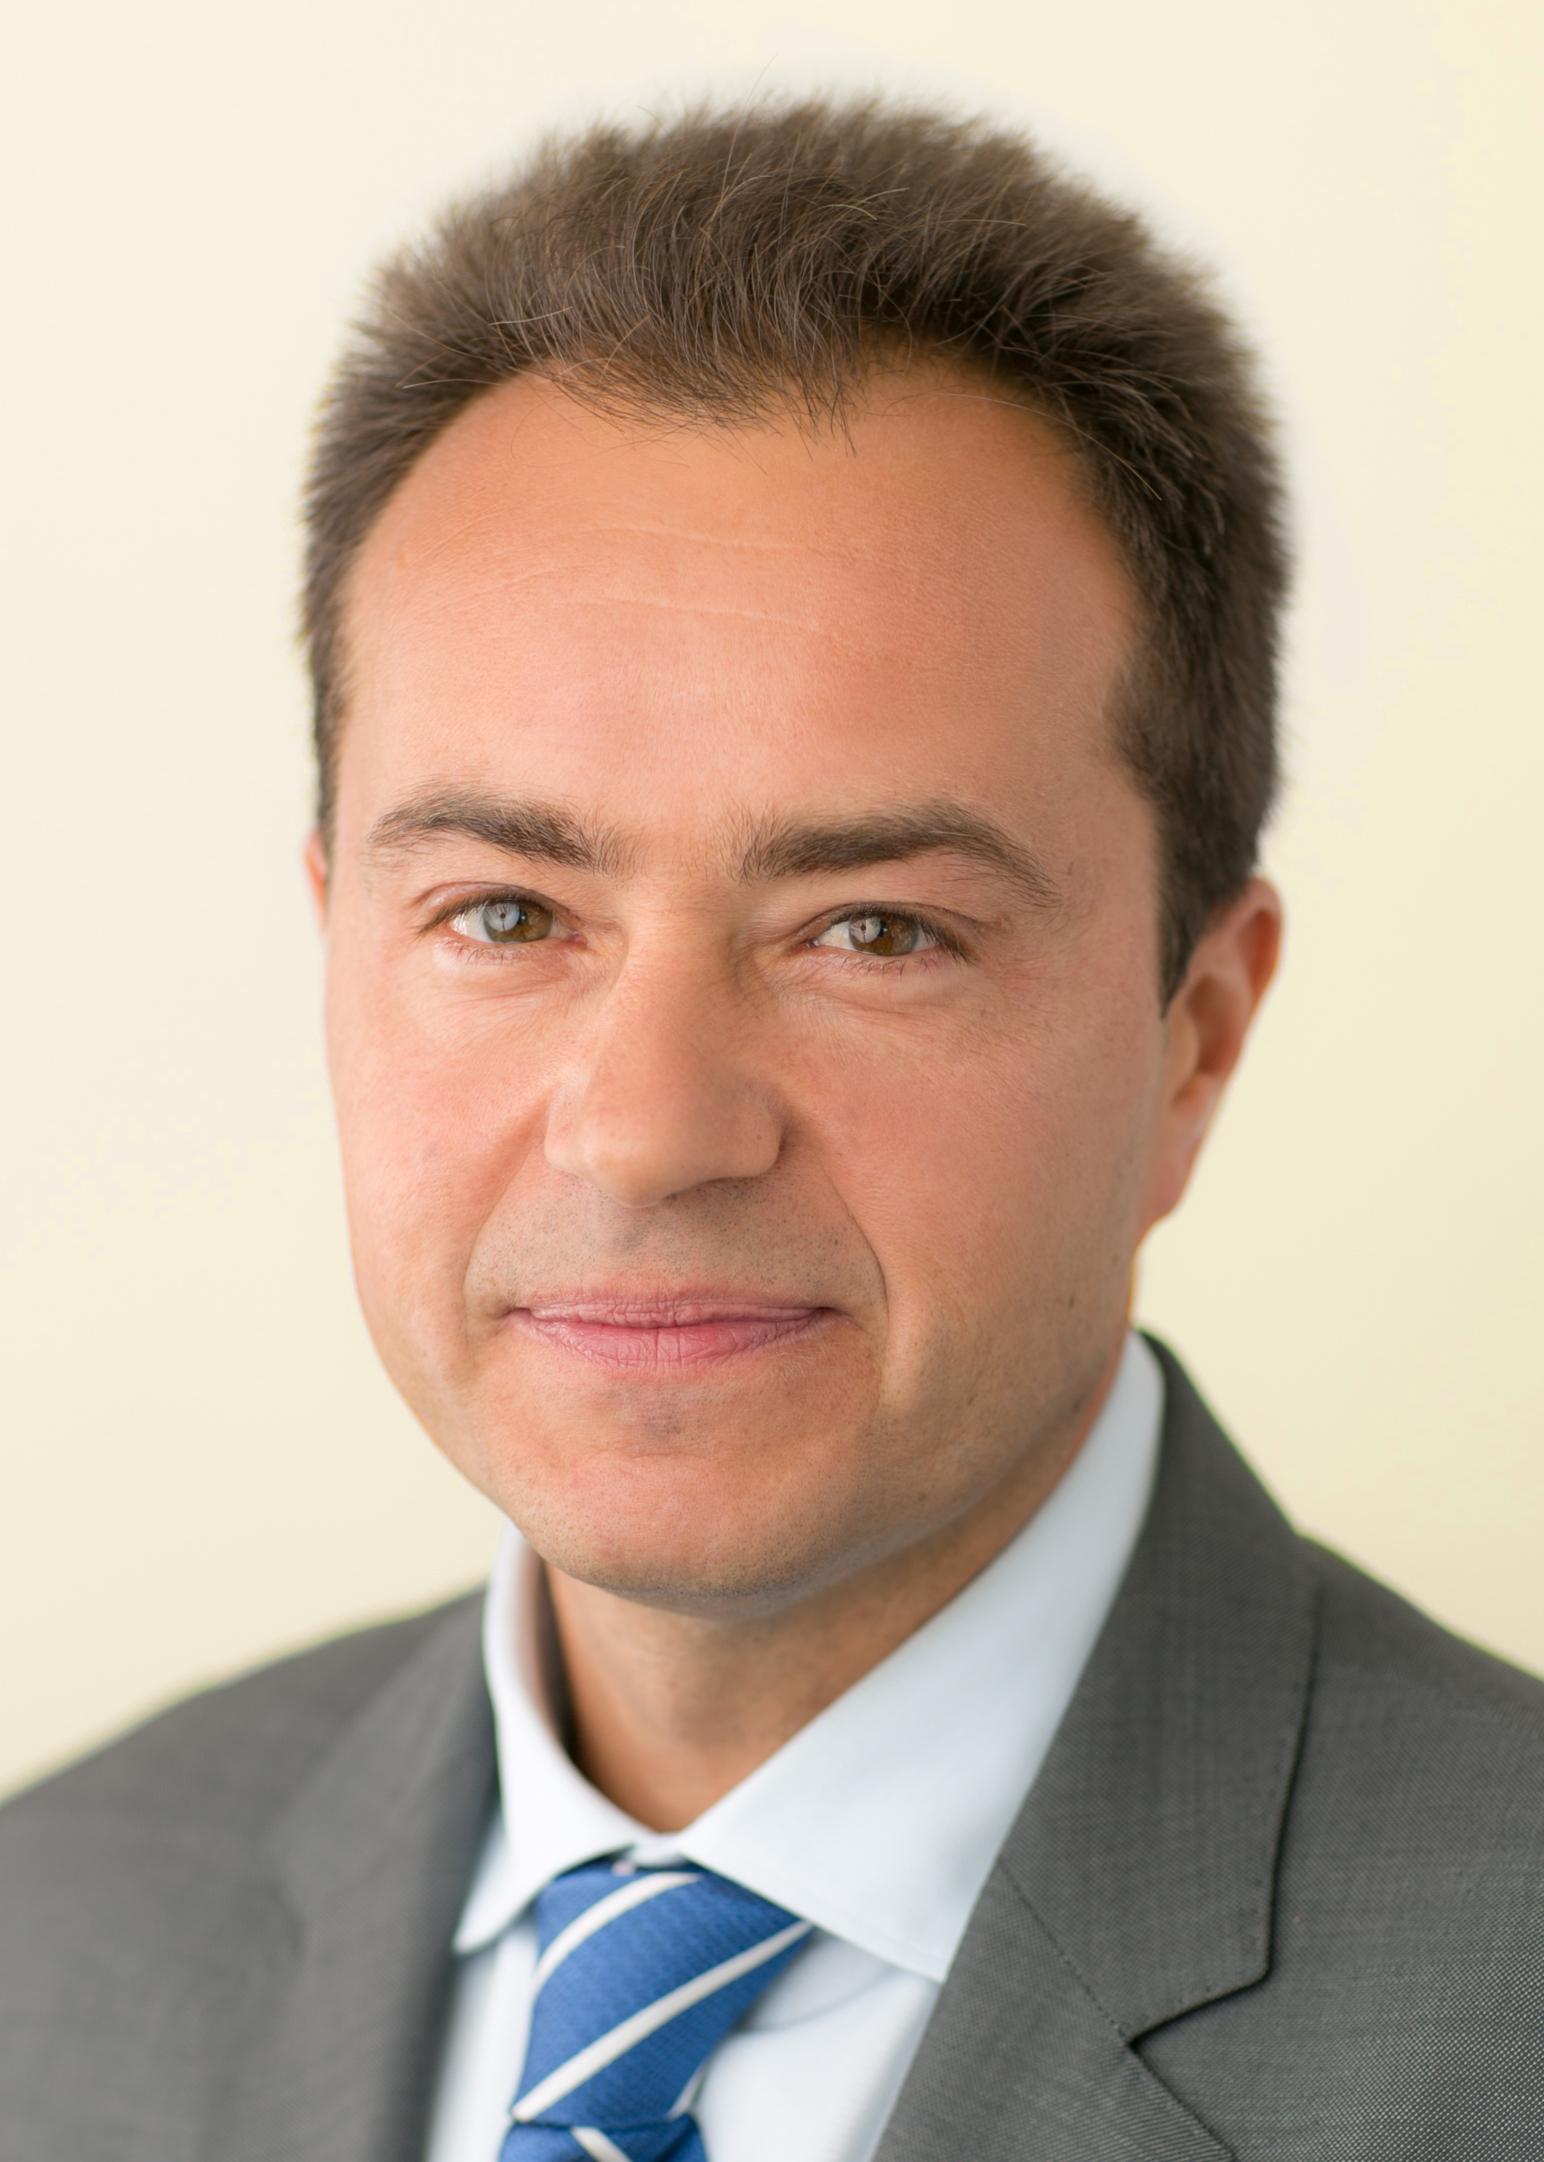 Frank Cilluffo